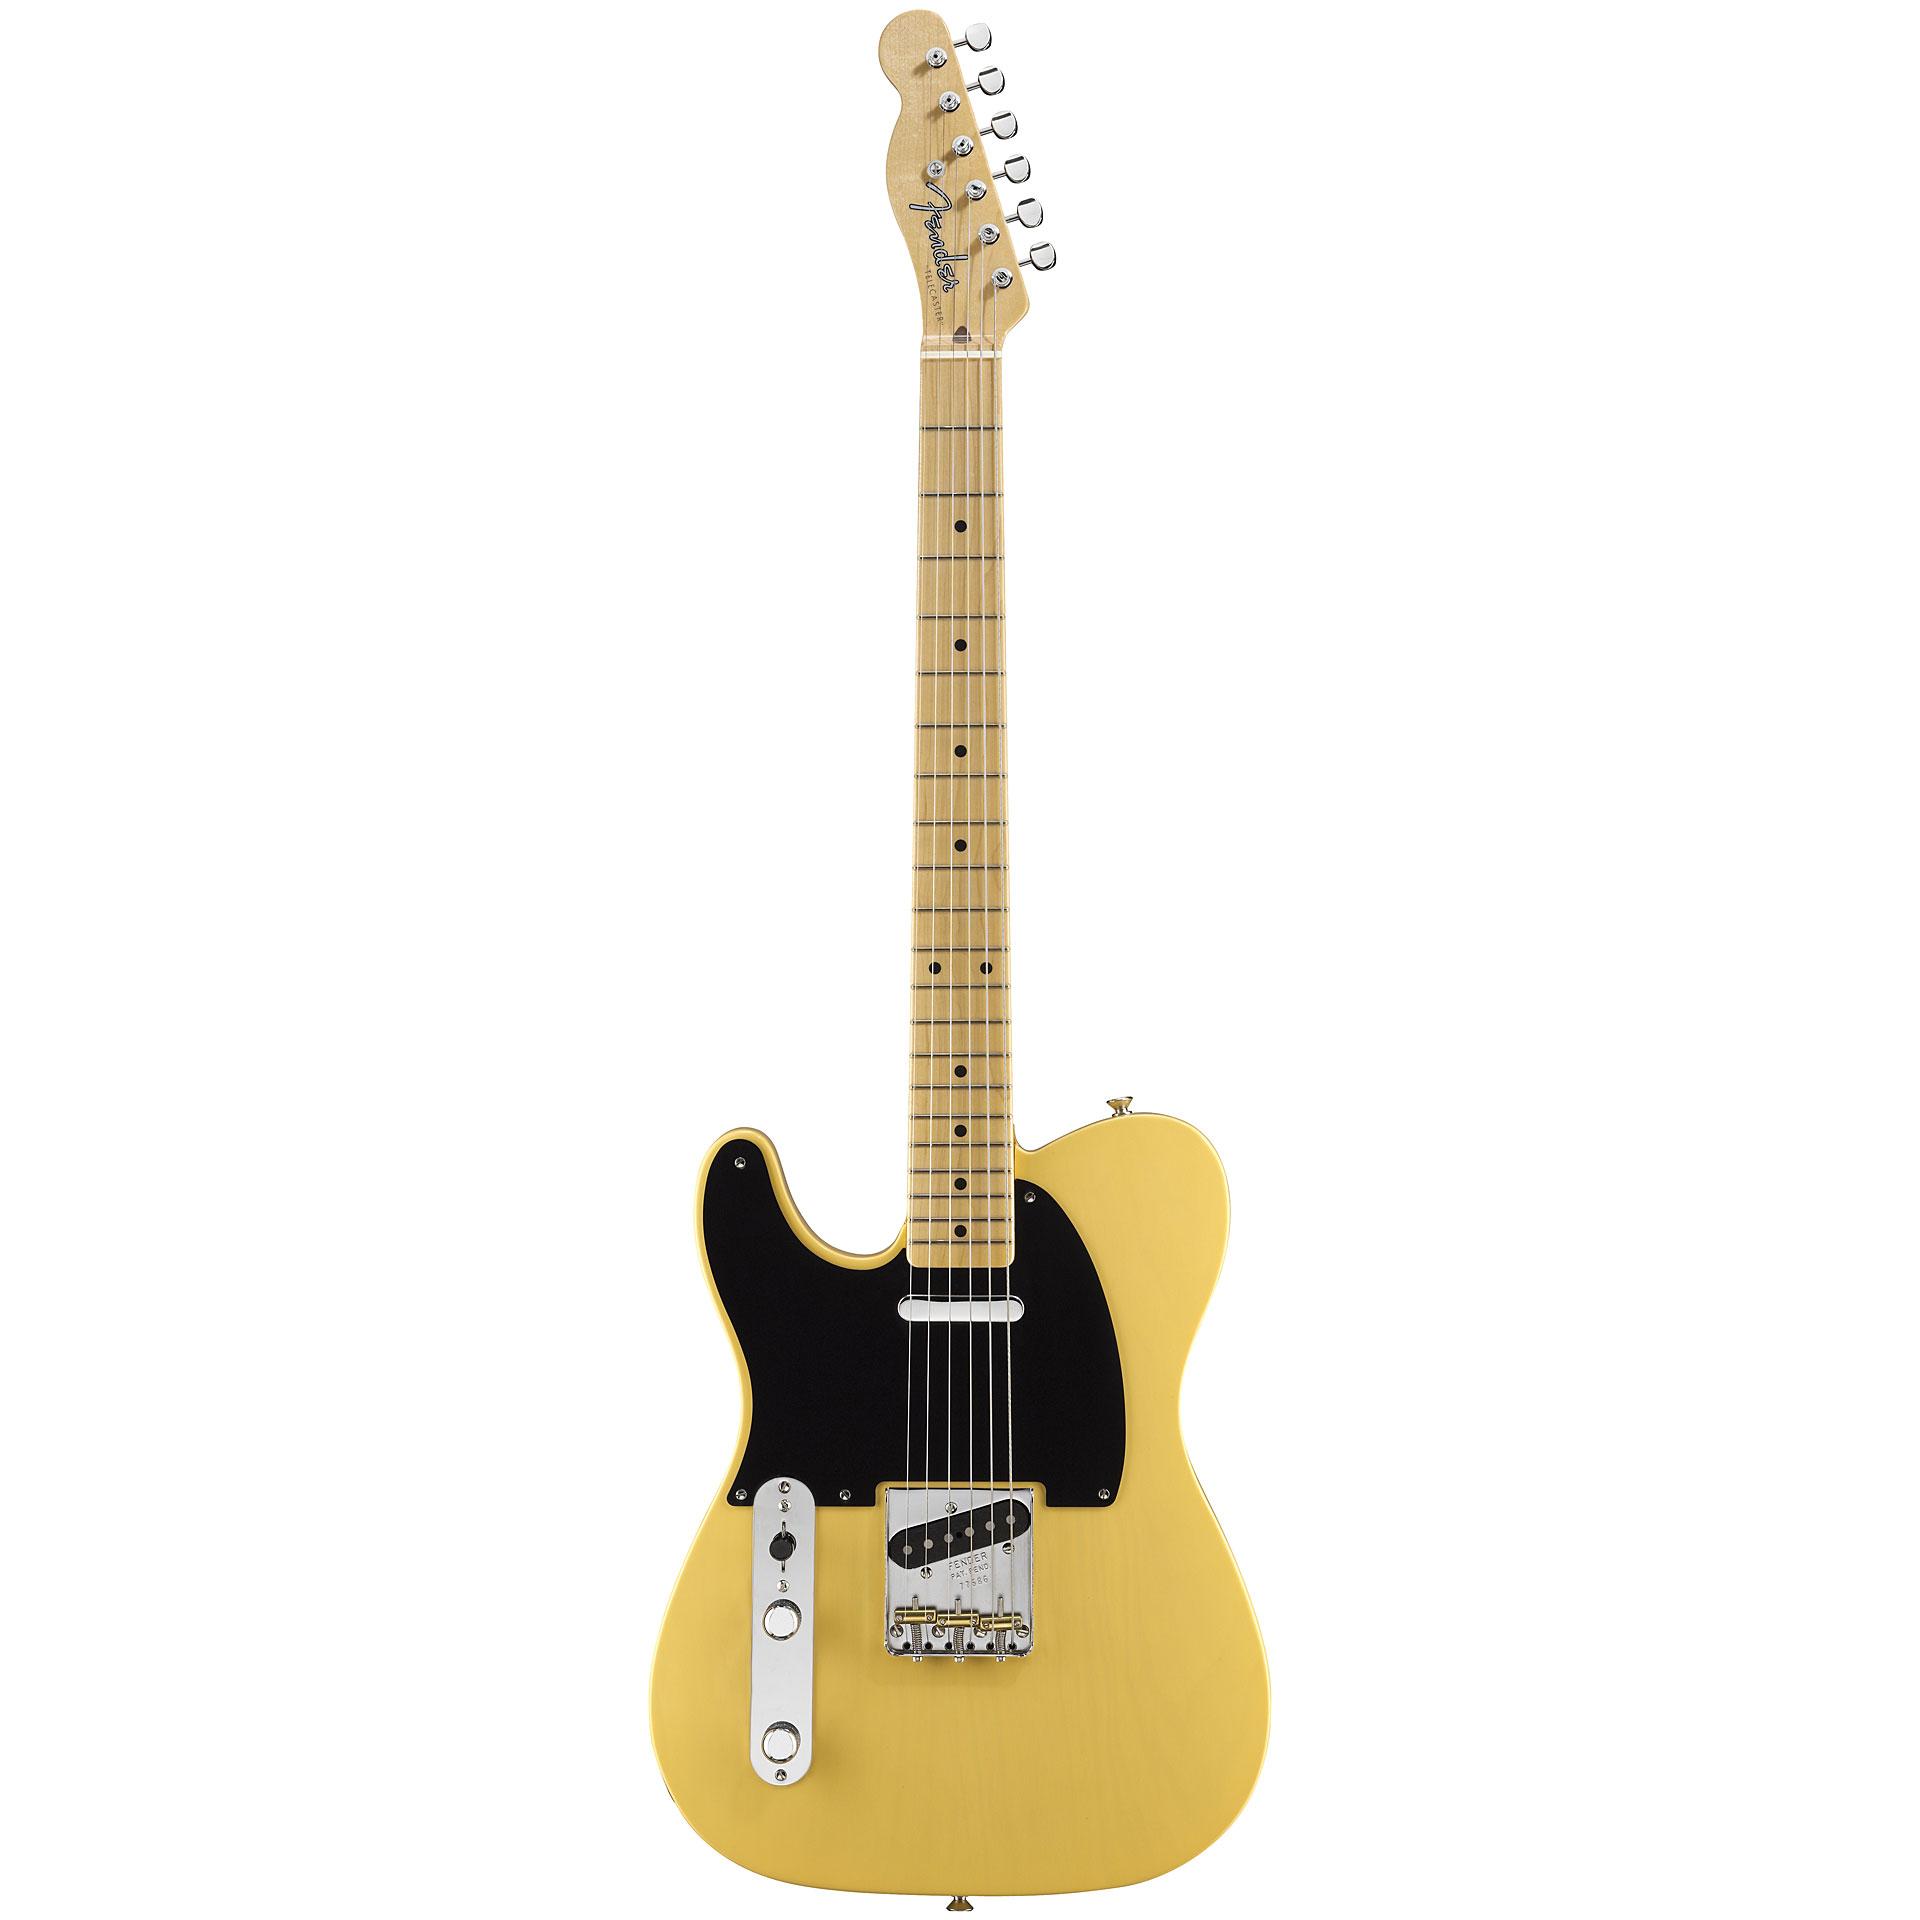 Fender Gen 4 pastillas Stratocaster silencioso en